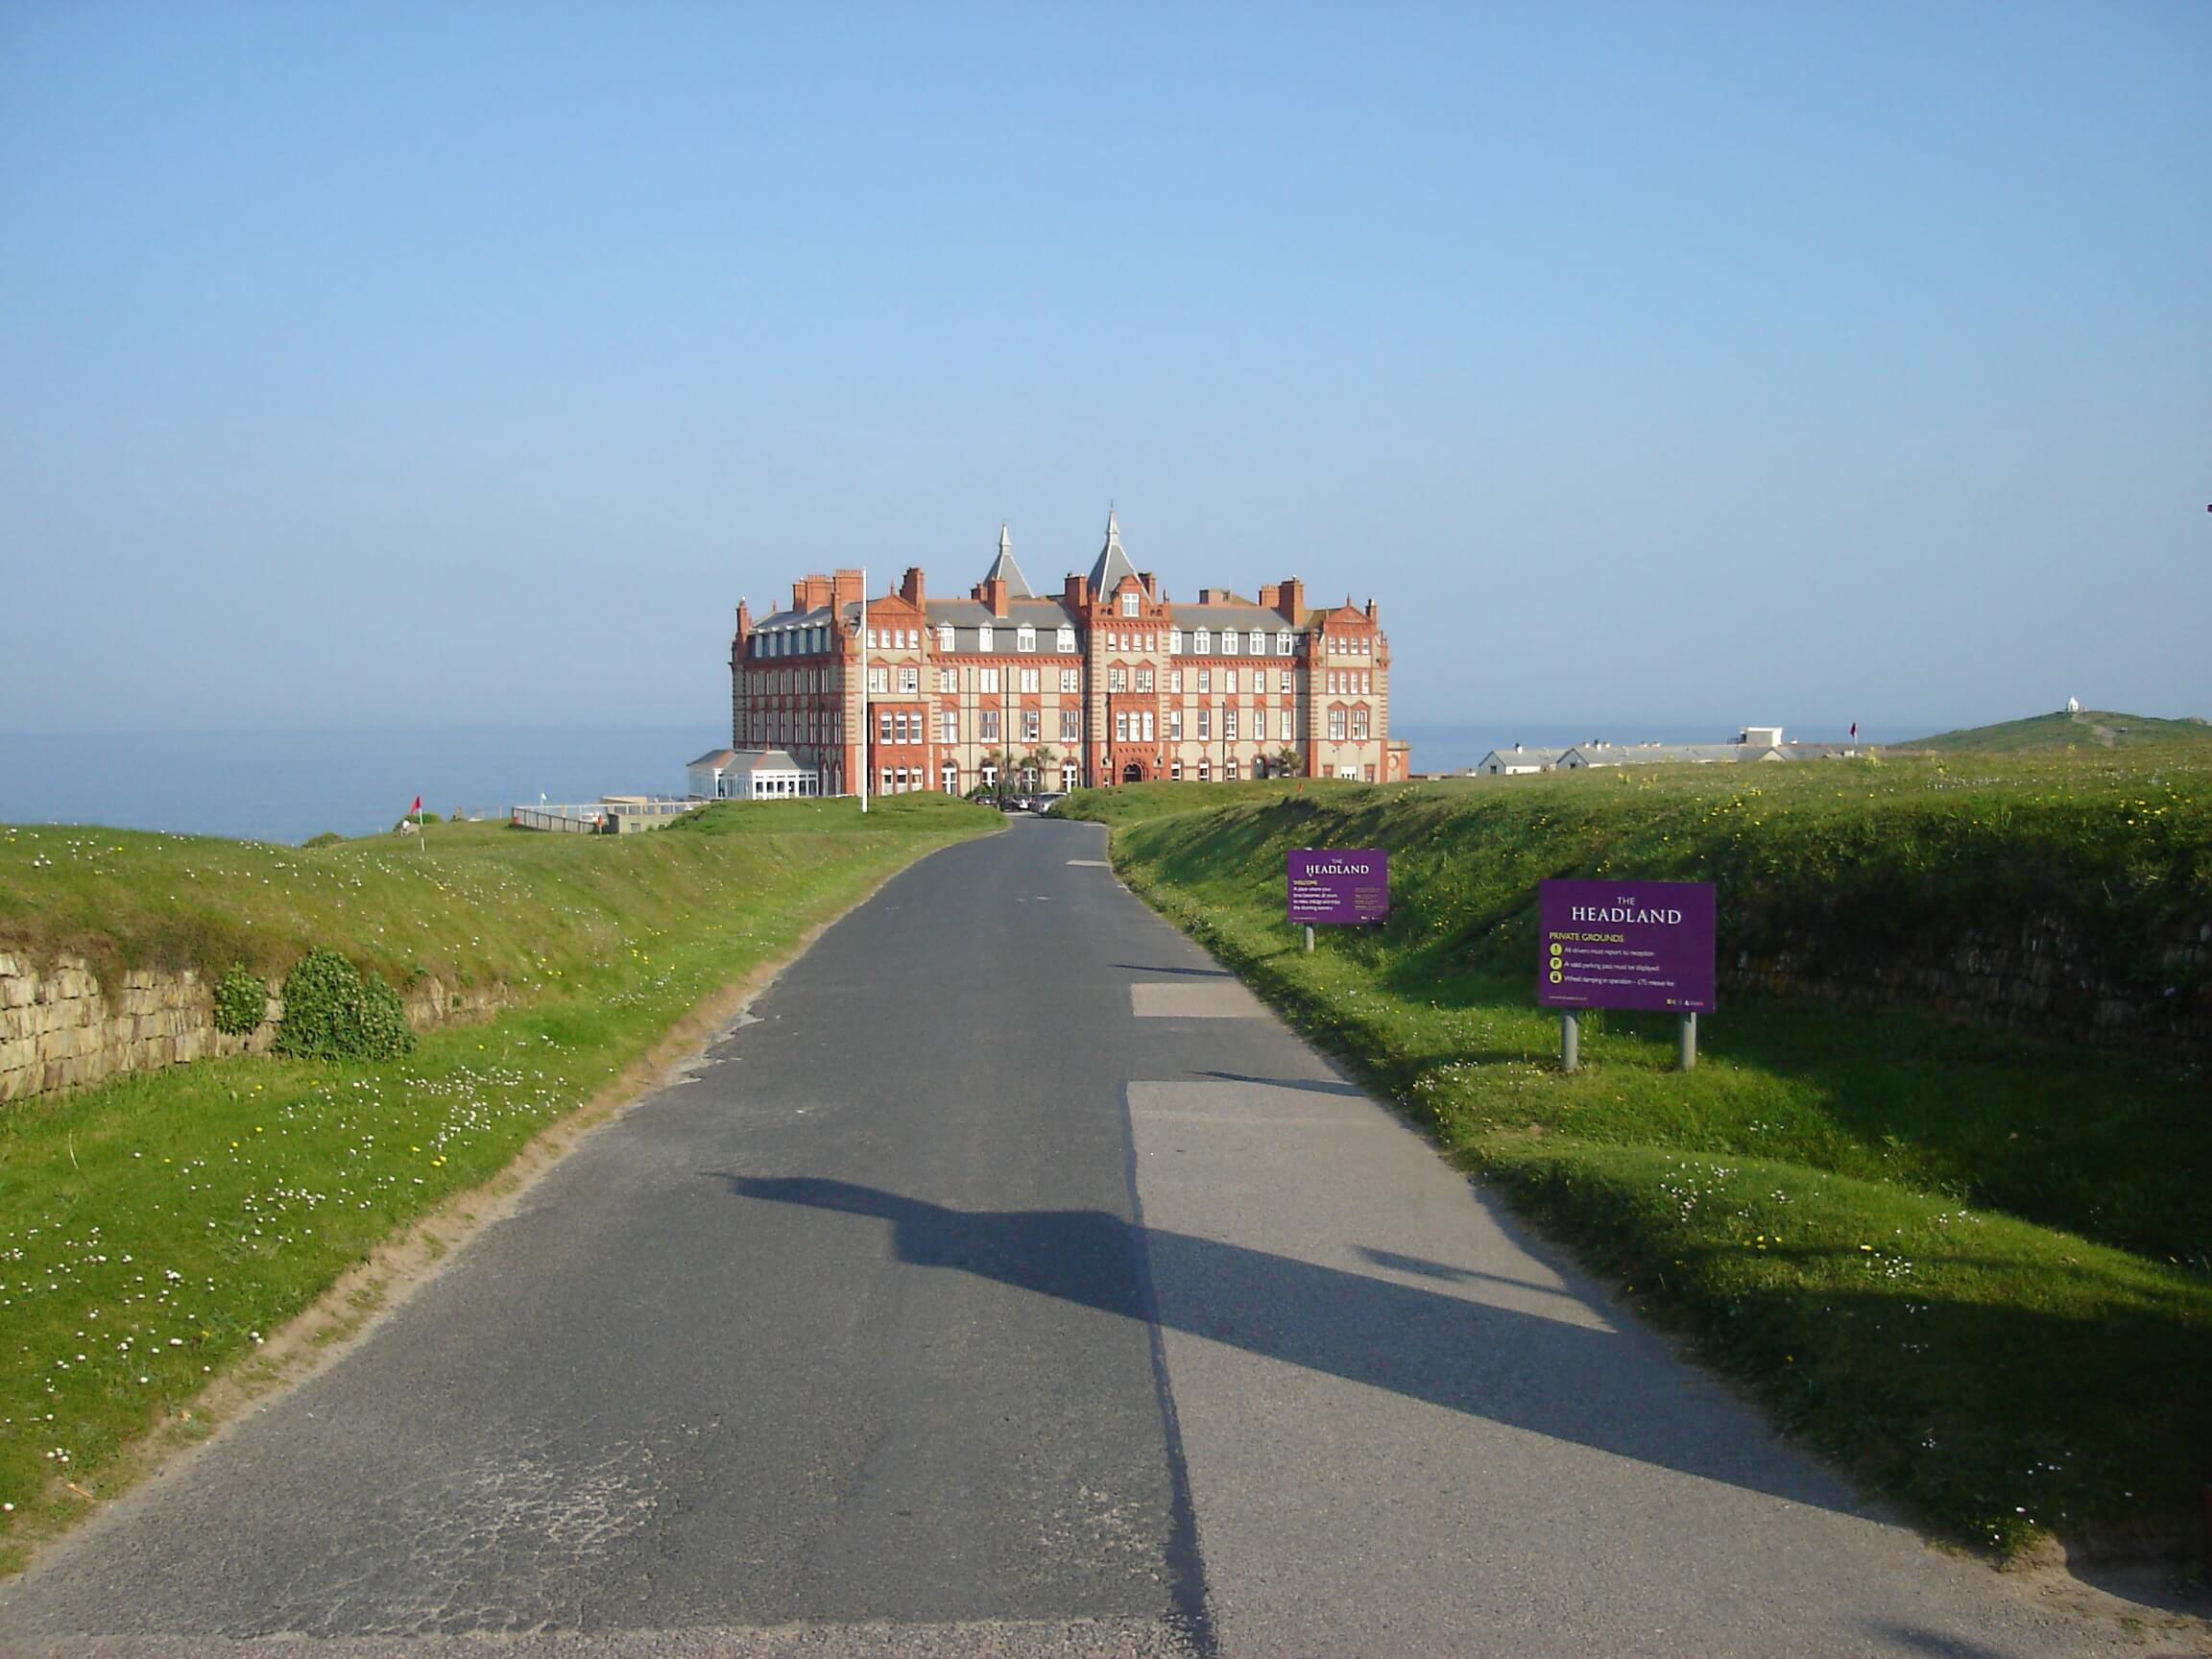 The Headland Hotel